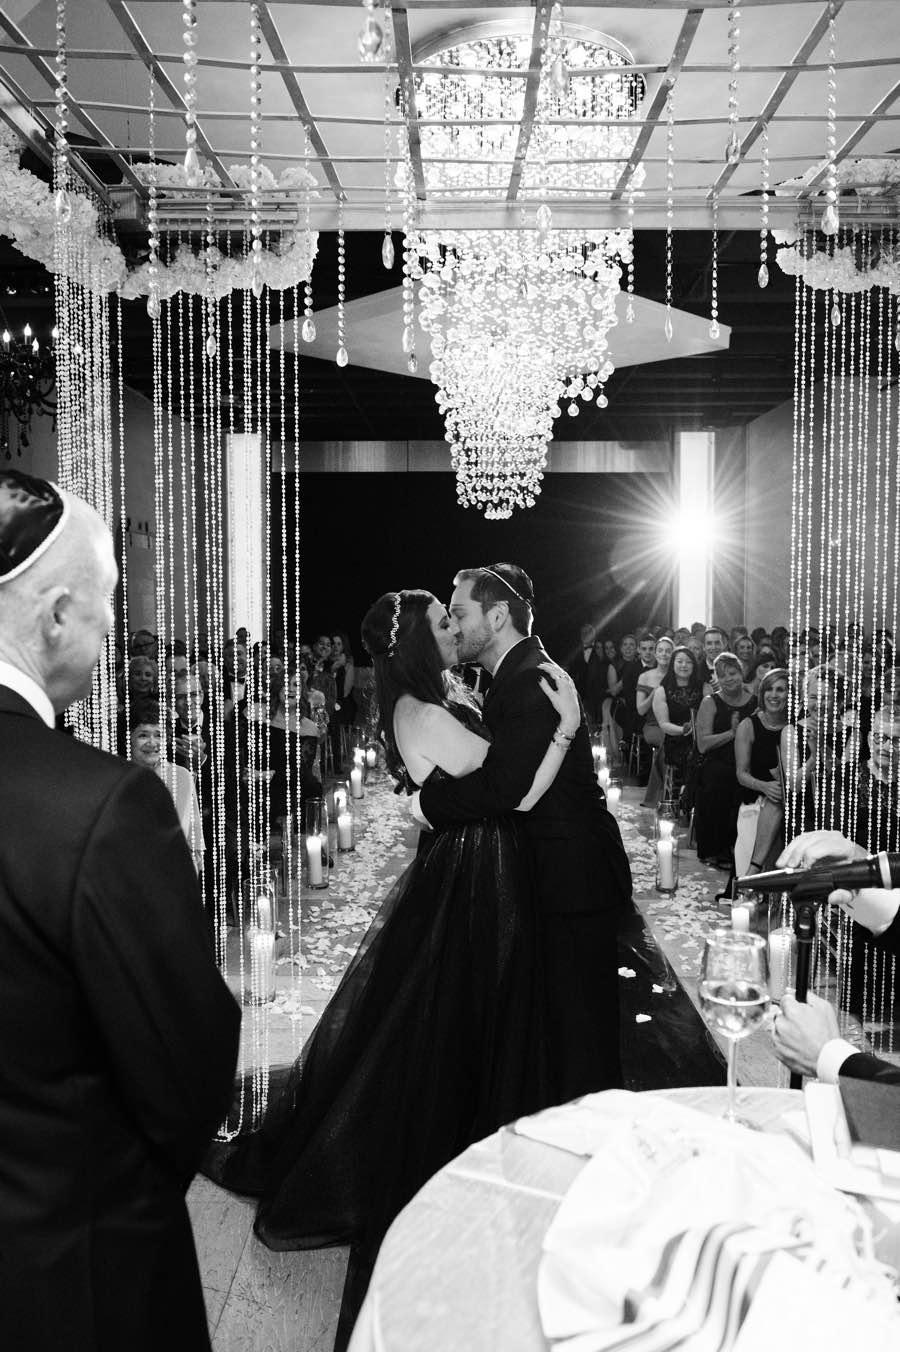 Tendenza wedding ceremony